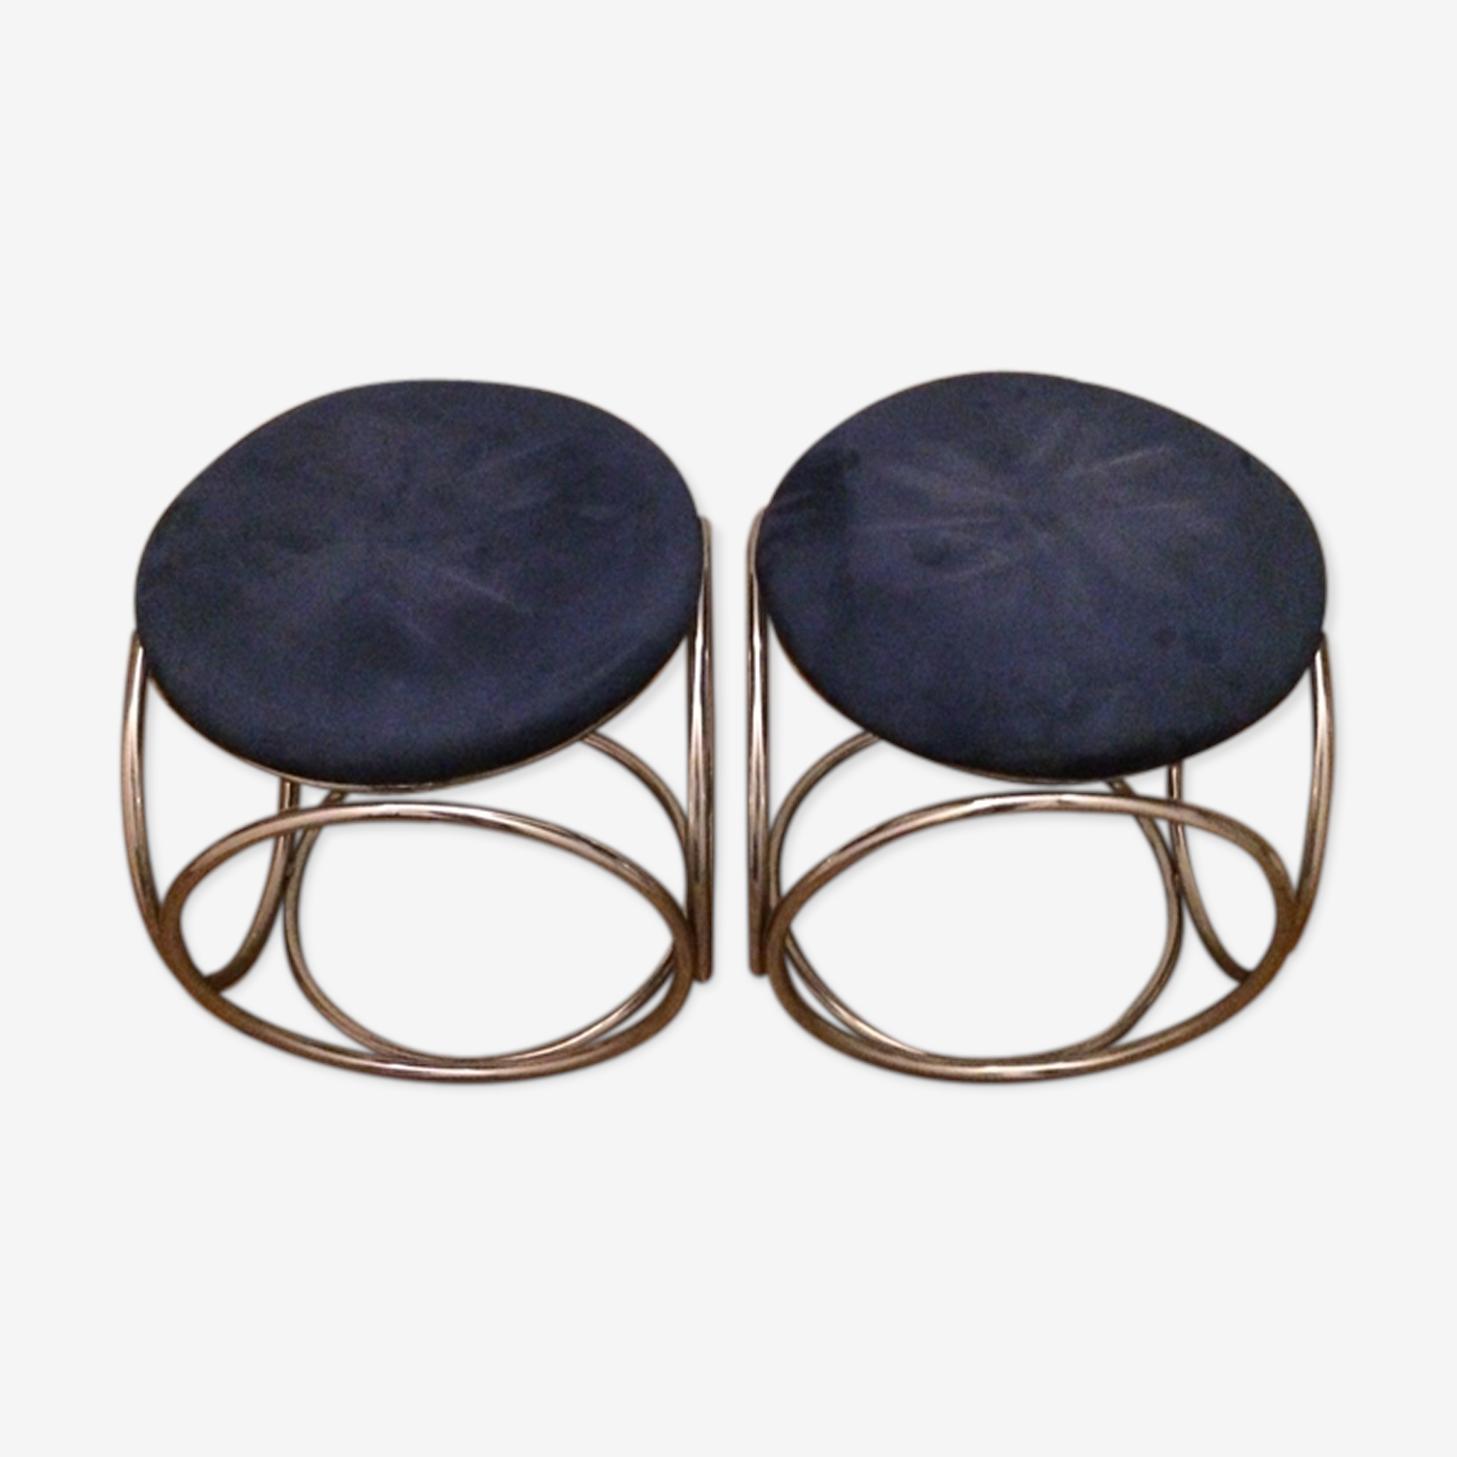 2 stools 1968